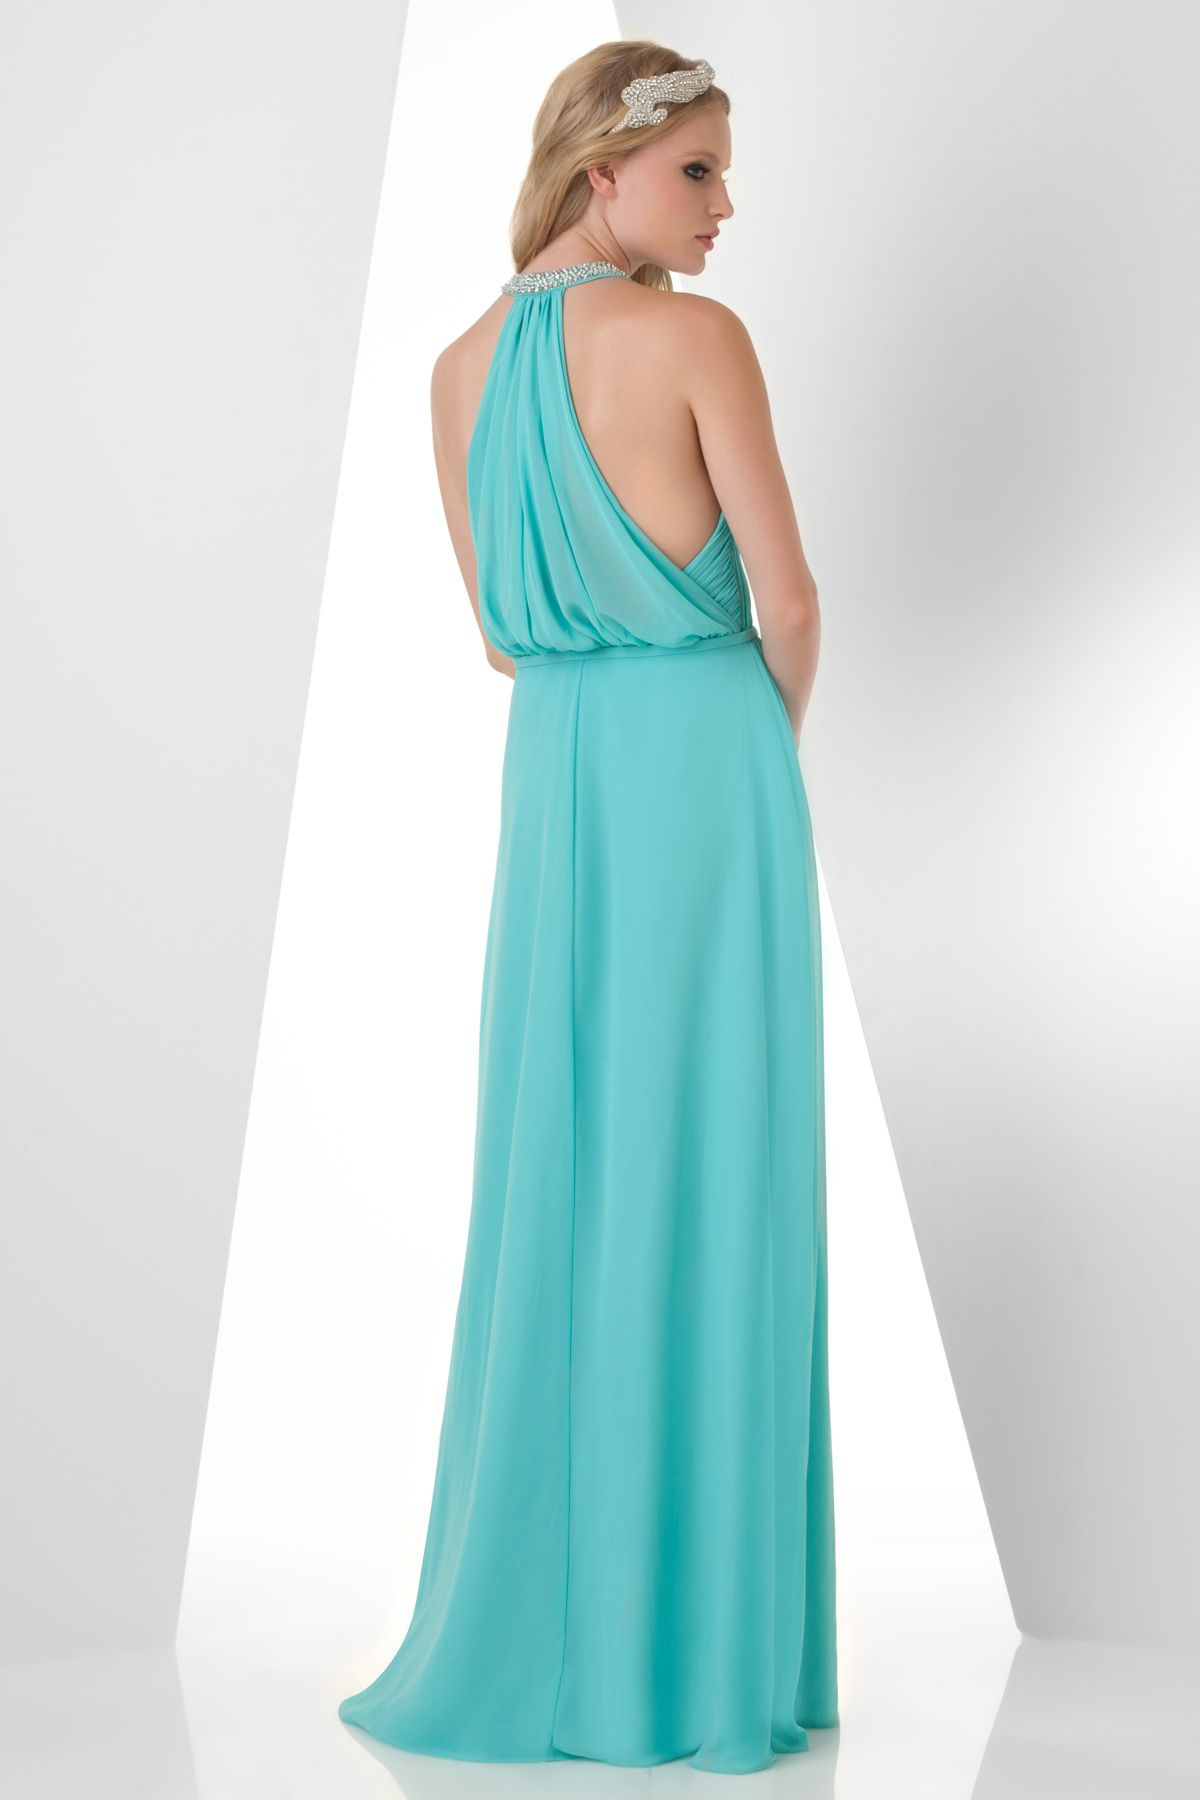 Back of the Bari Jay halter dress - elegant, classy & unique. Love ...